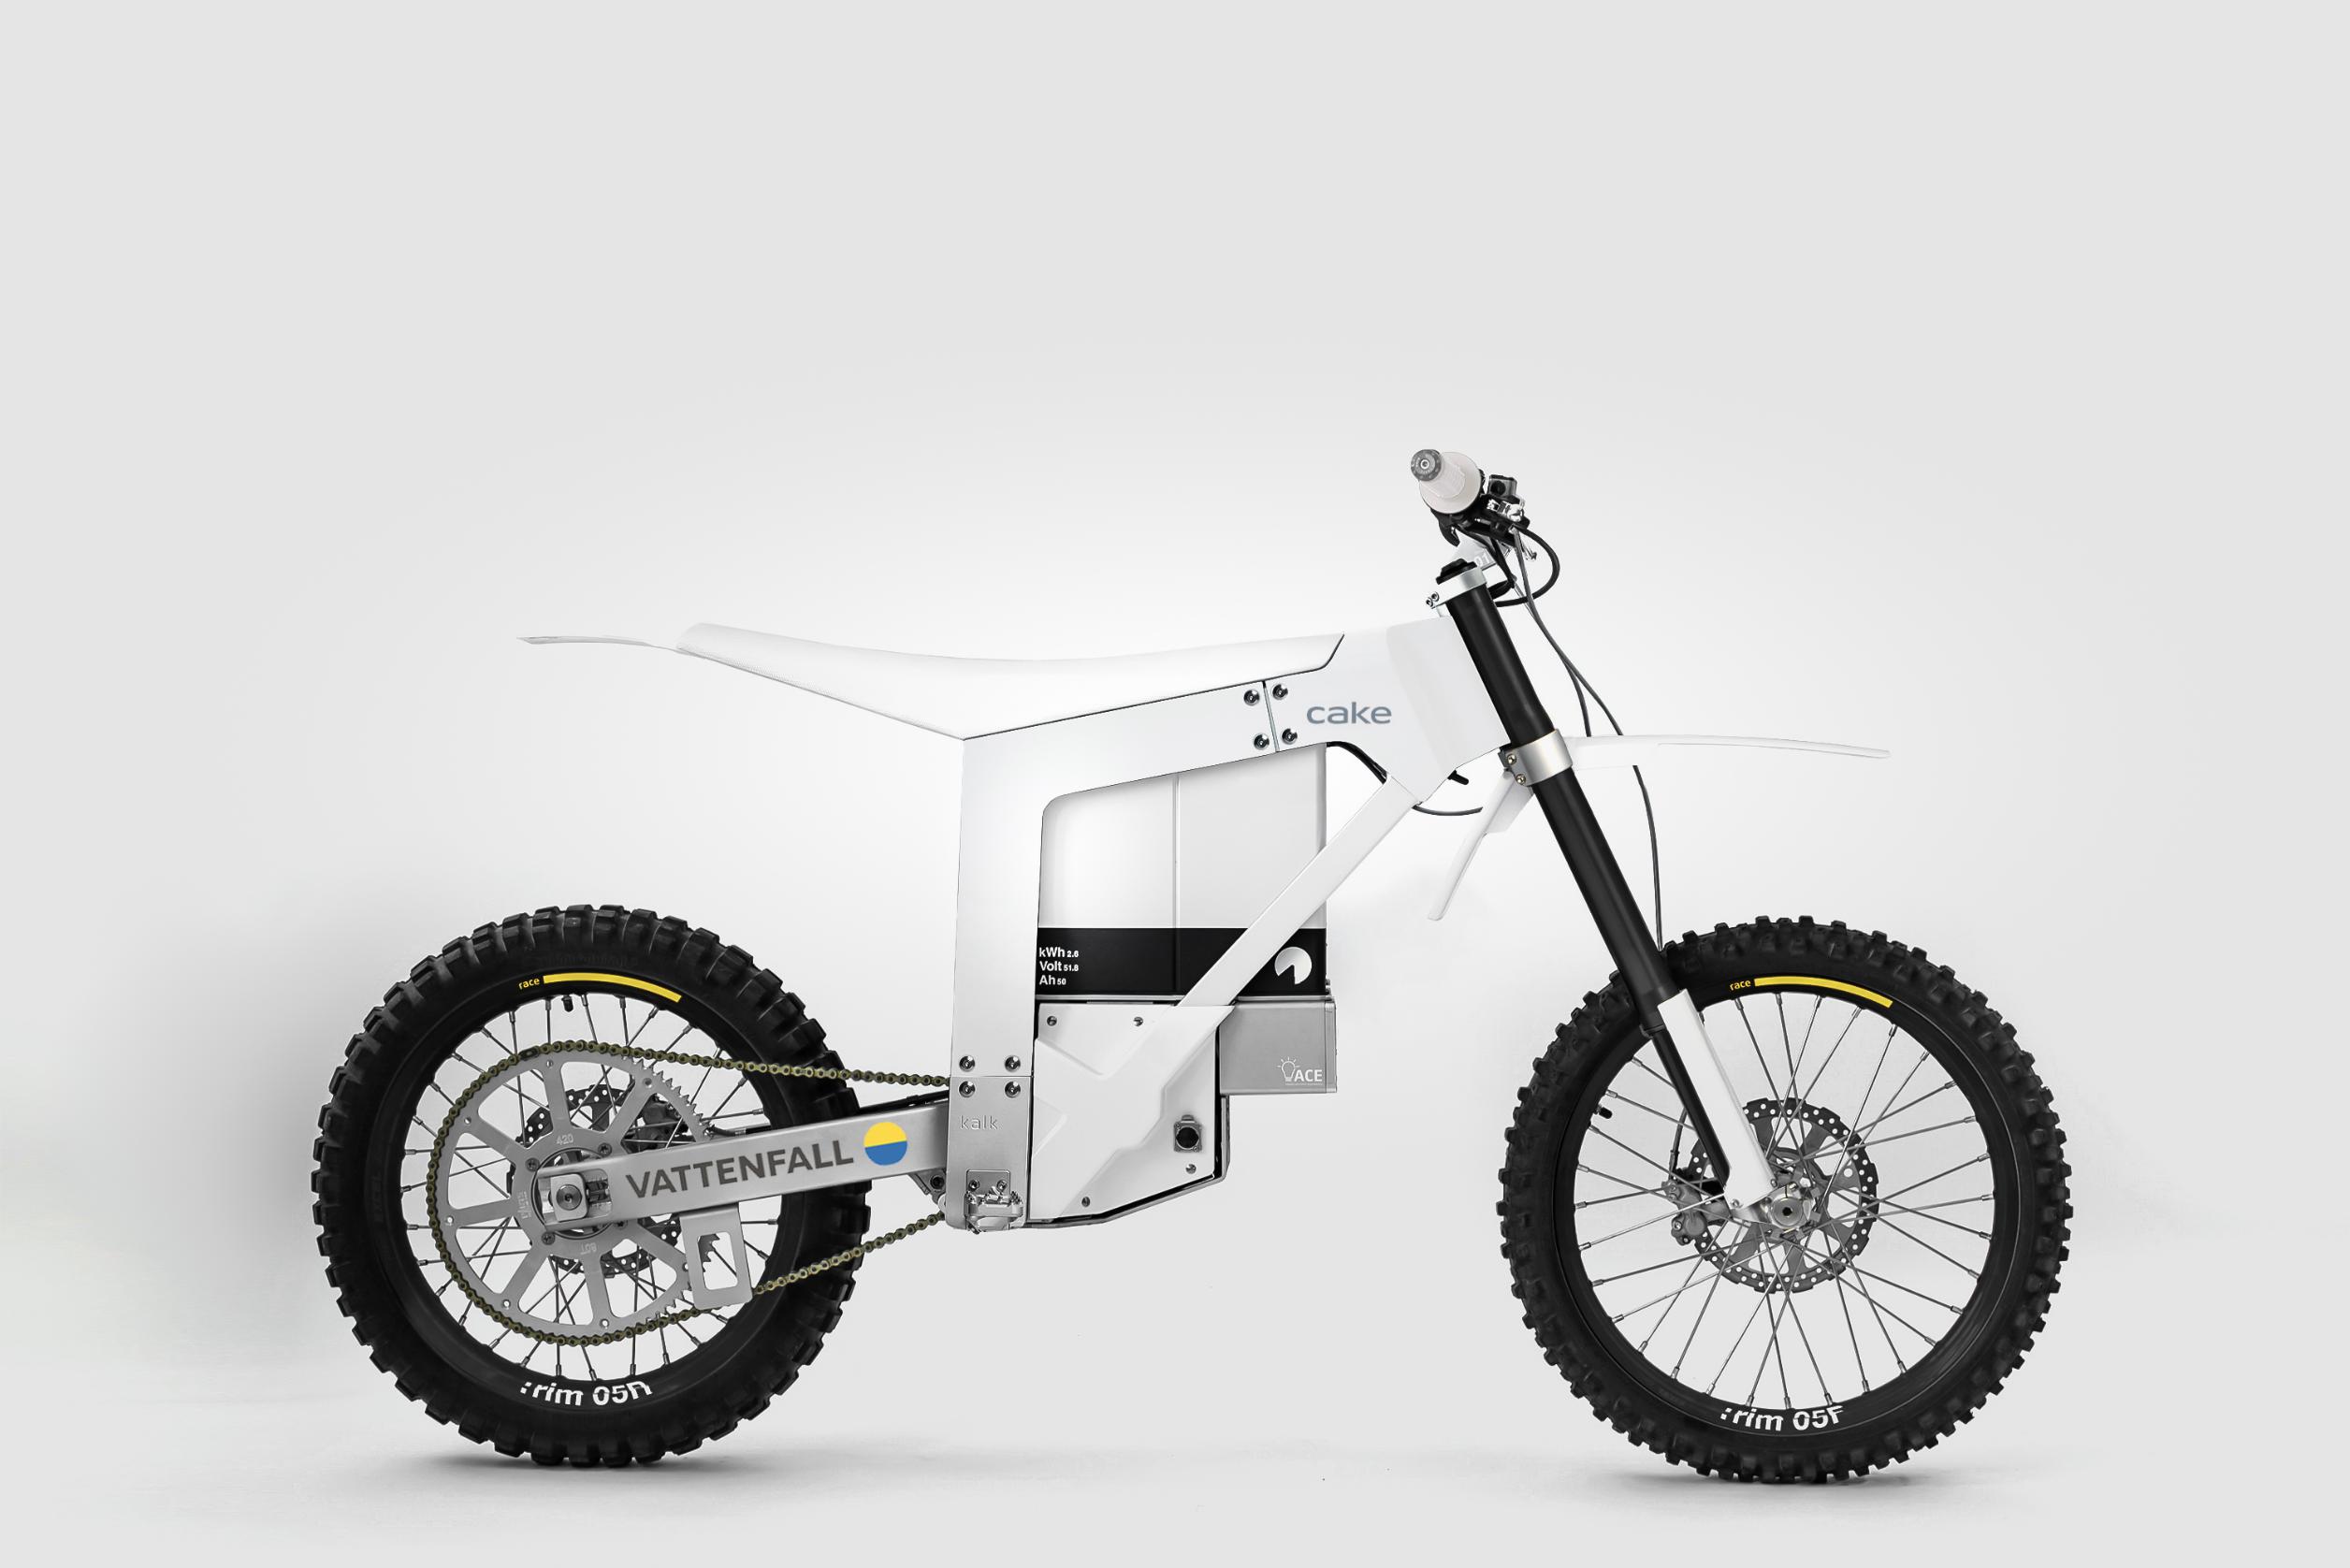 CAKE Vattenfall bike first generation prototype